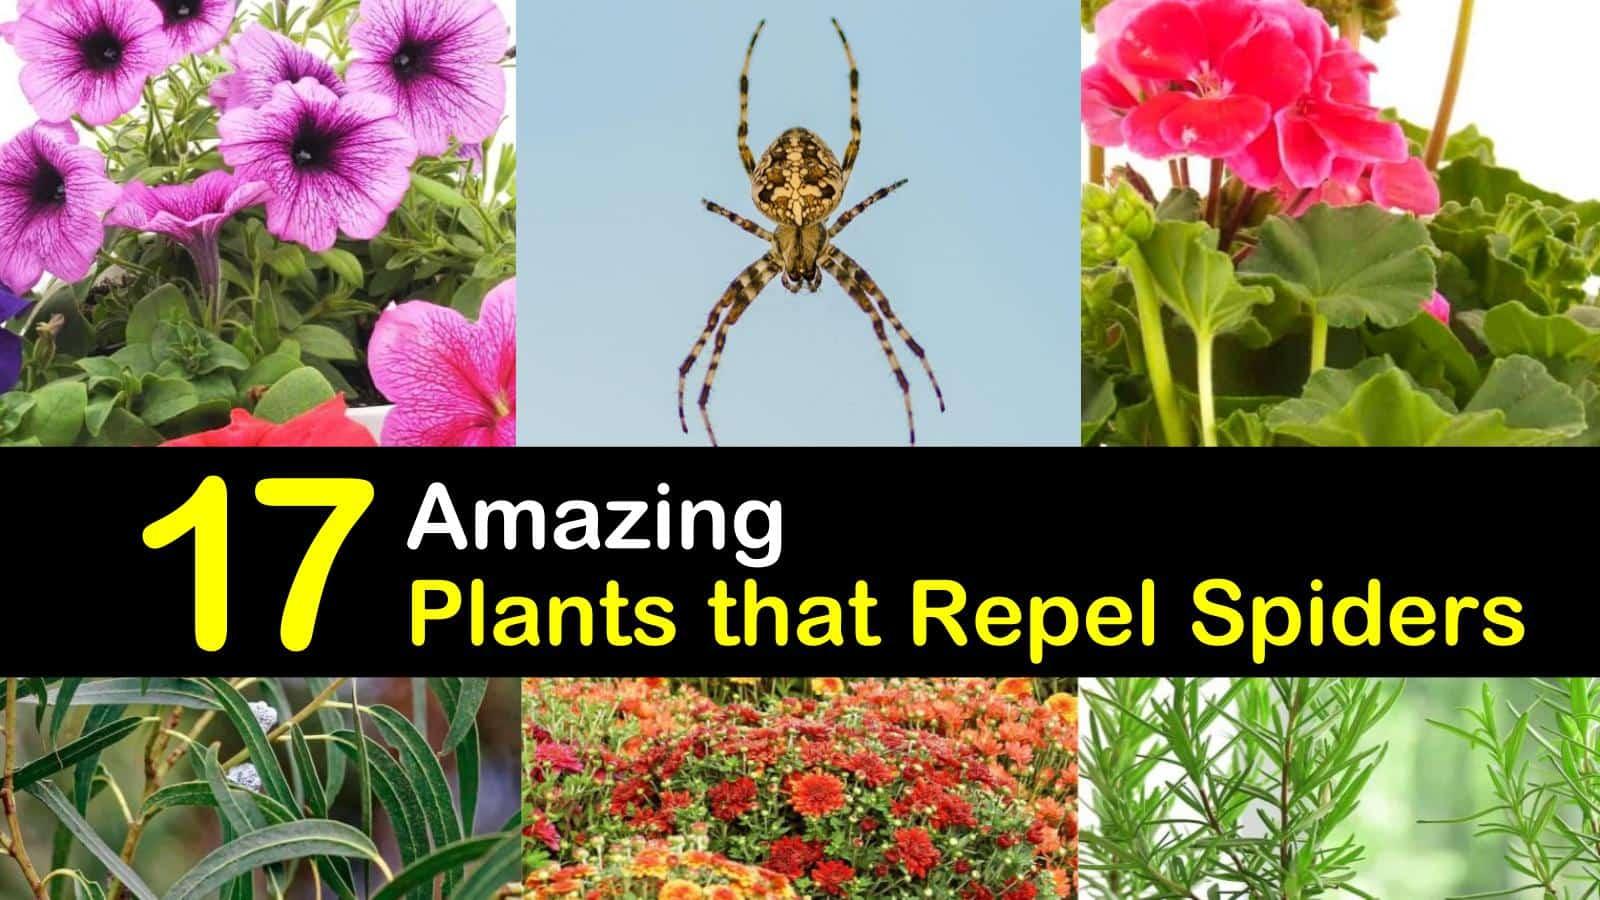 17 Amazing Plants that Repel Spiders